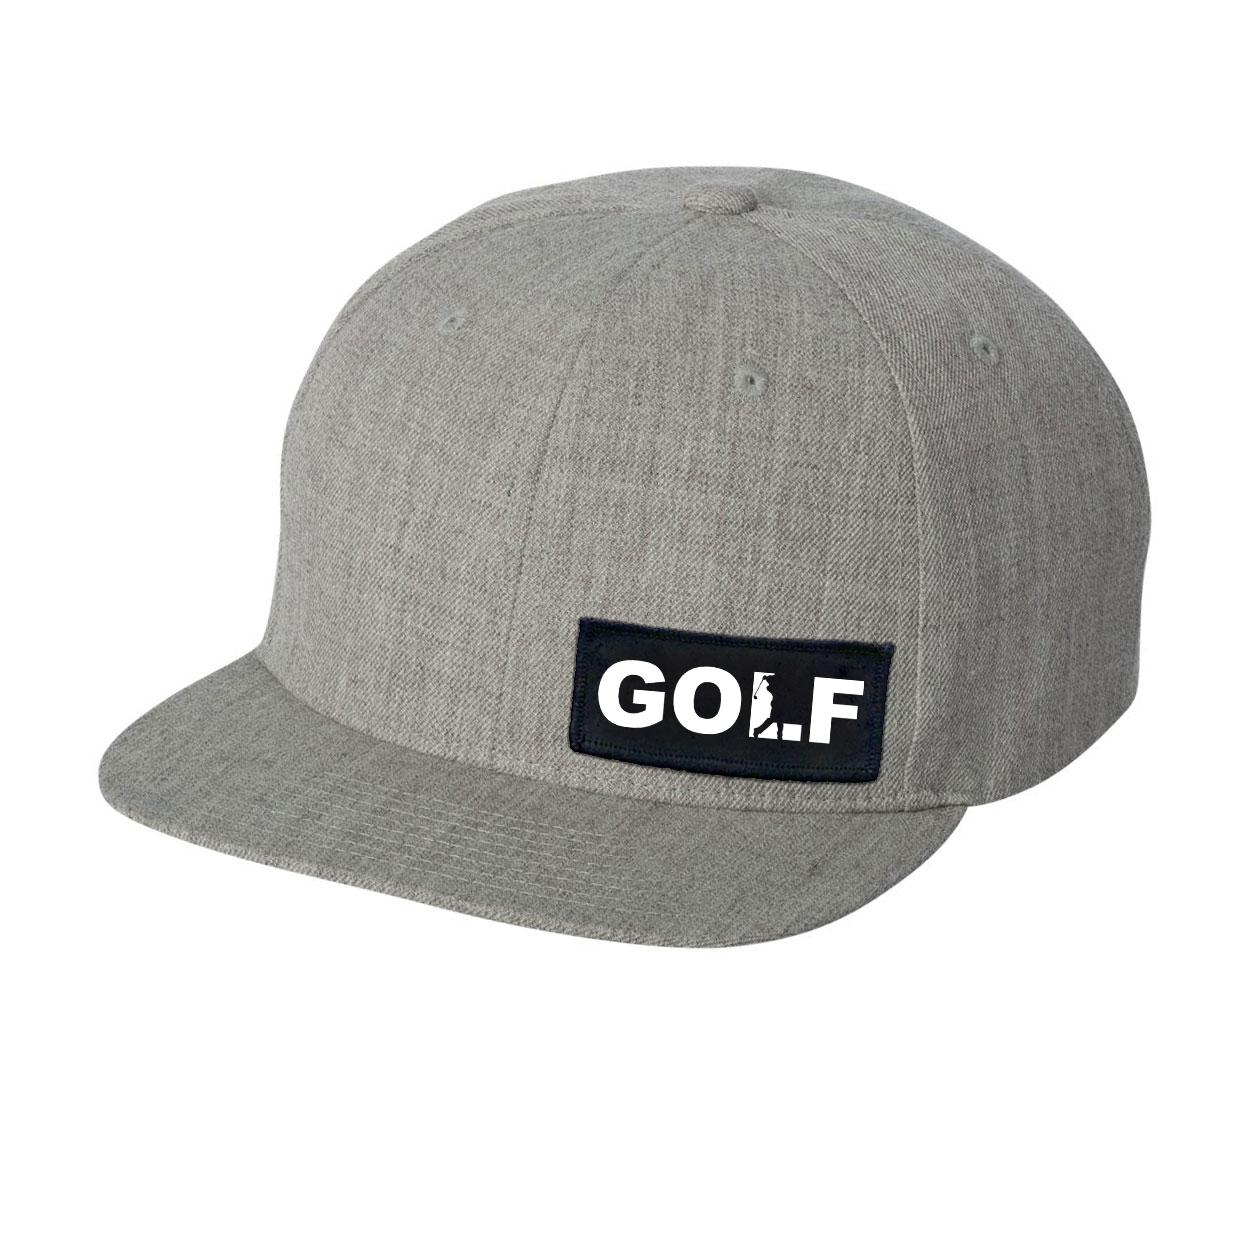 Golf Swing Logo Night Out Woven Patch Flat Brim Snapback Hat Heather Gray (White Logo)